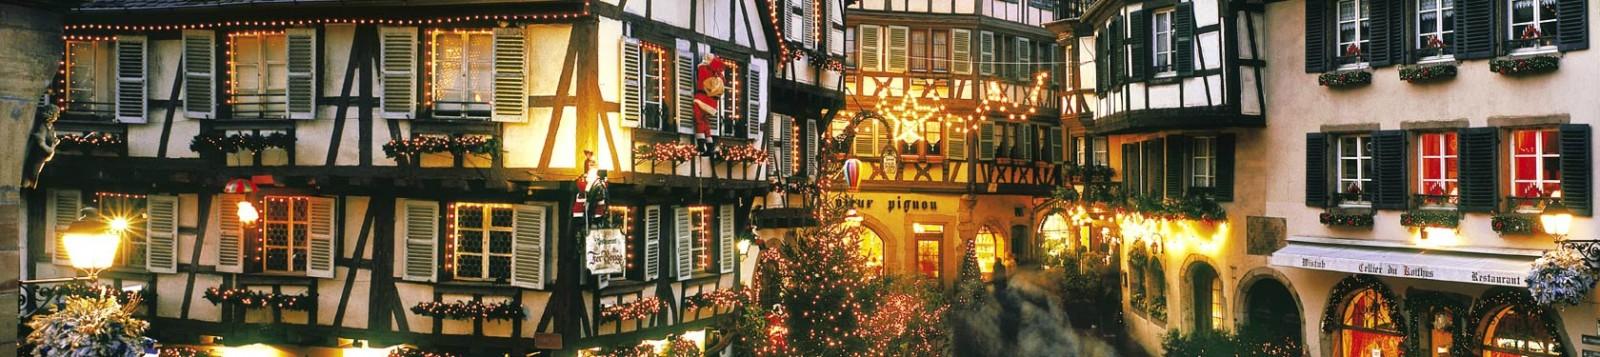 Image De Noel En Alsace.Capitales De Noel En Alsace Voyages Remi